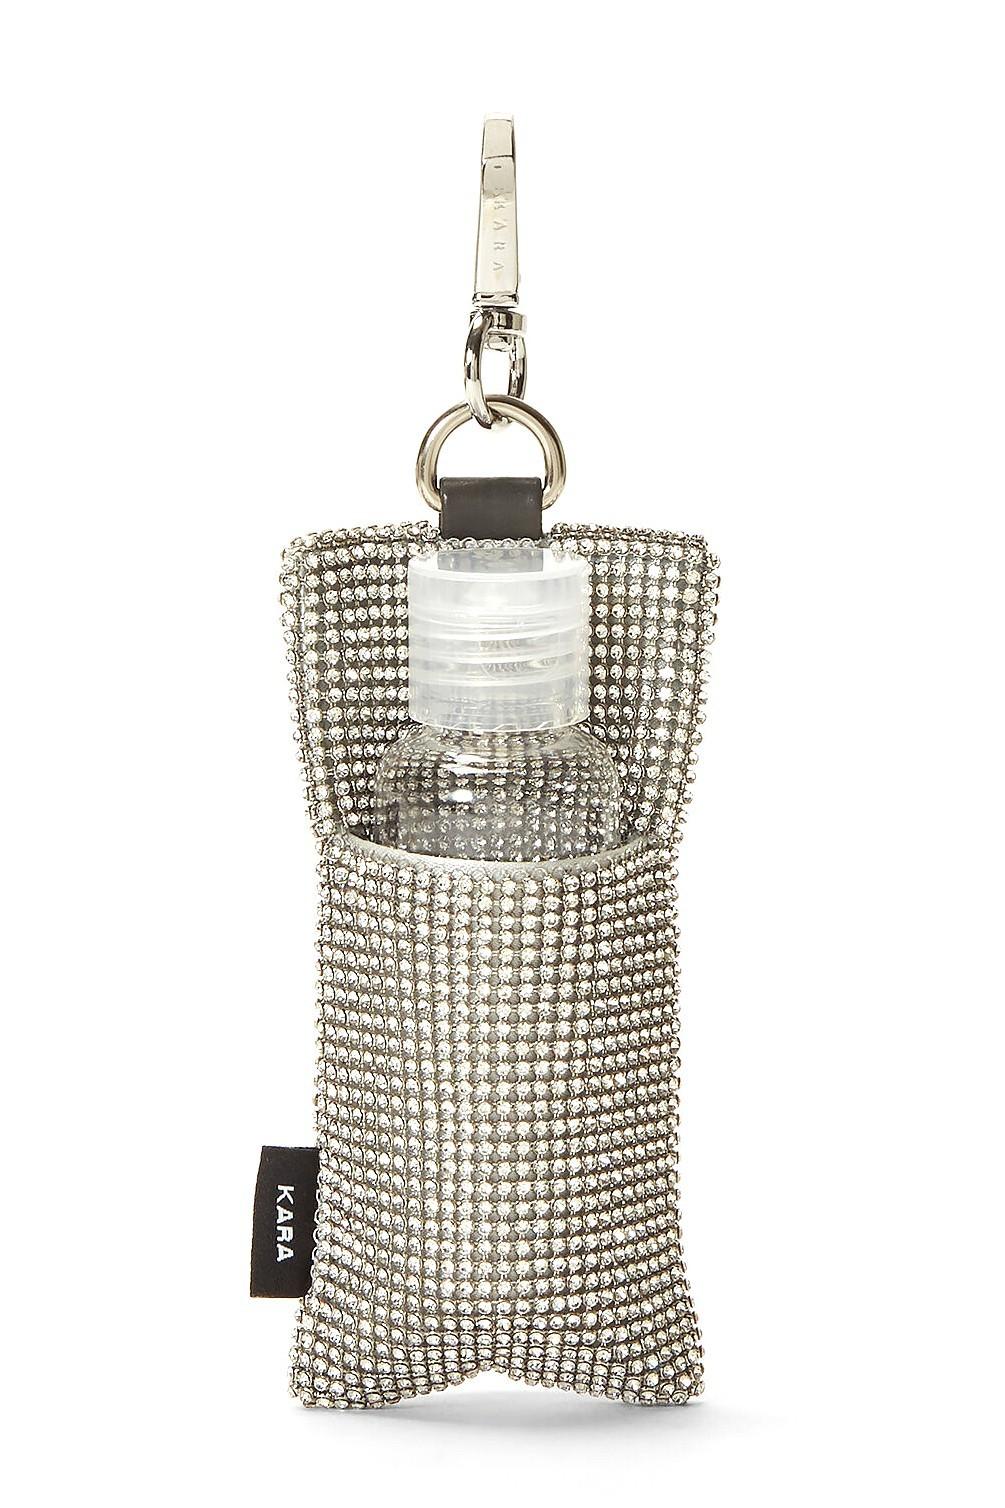 KARA的水晶覆盖锁链邮袋可让您携带时尚的洗手液